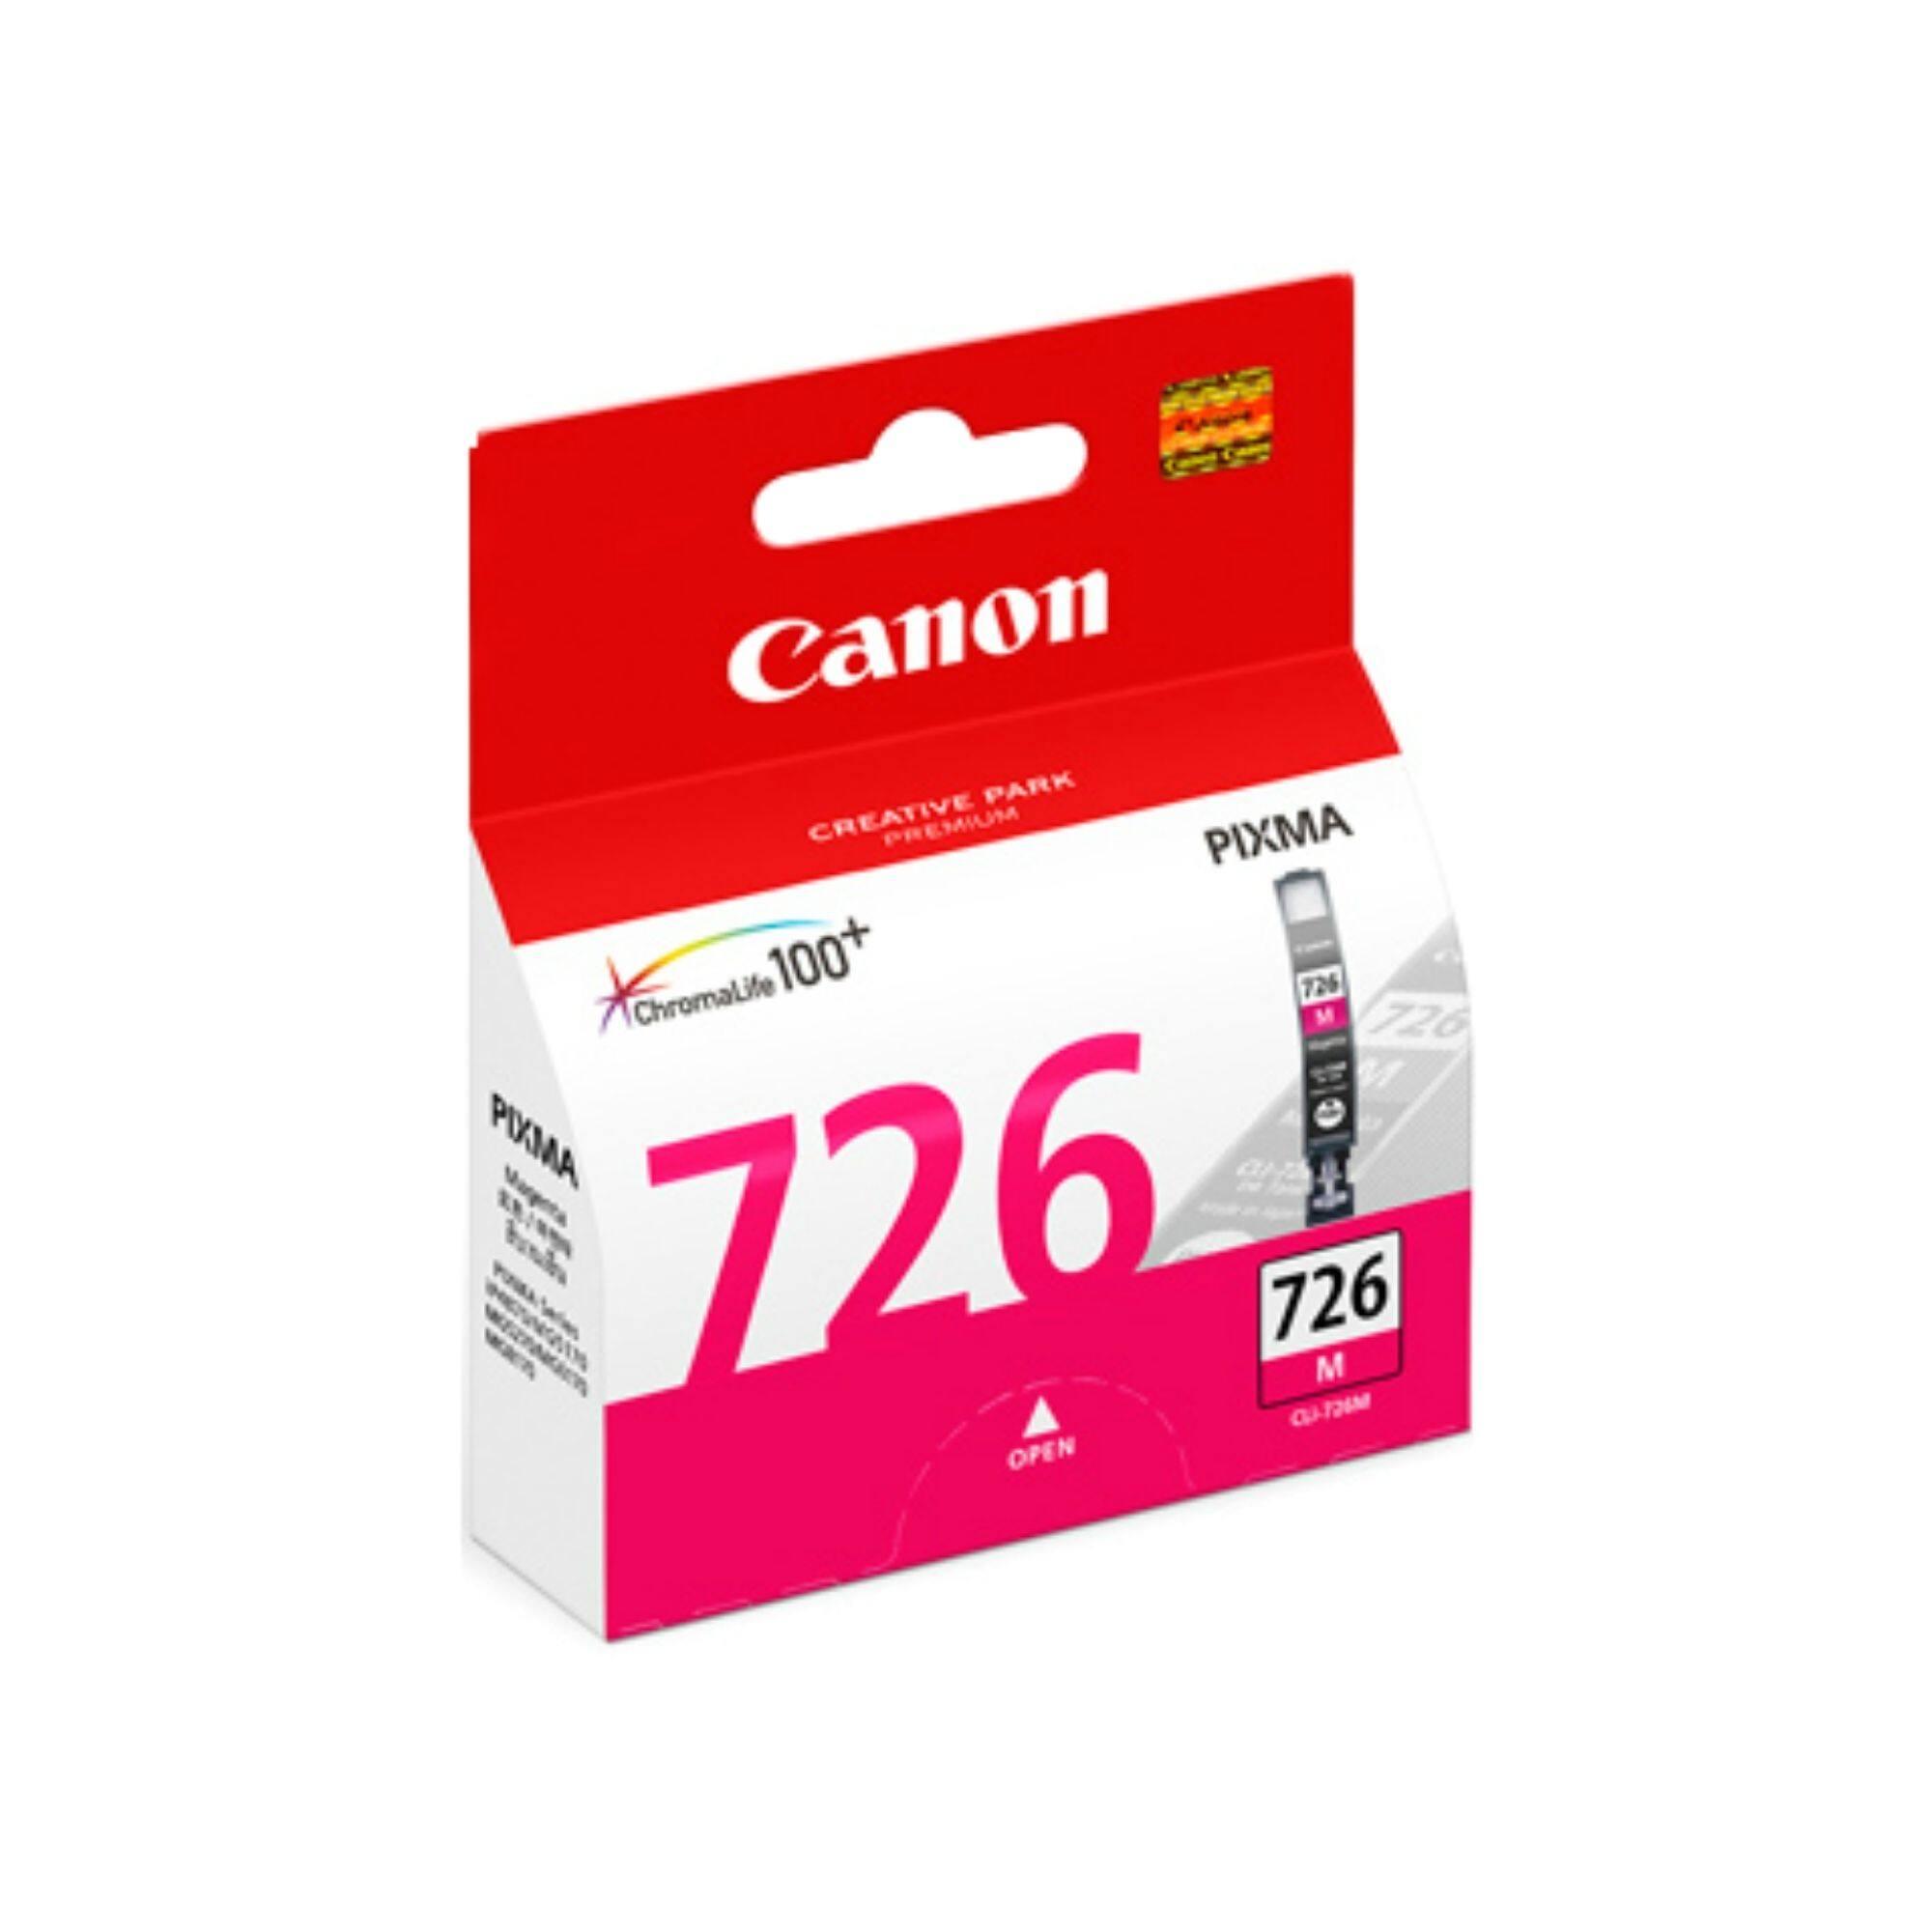 Canon CLI-726 Magenta Cartridge for iP4870/4970, MG5170/5270/5370/6170/6270/8170/8270, MX886/897, IX6560 Printer